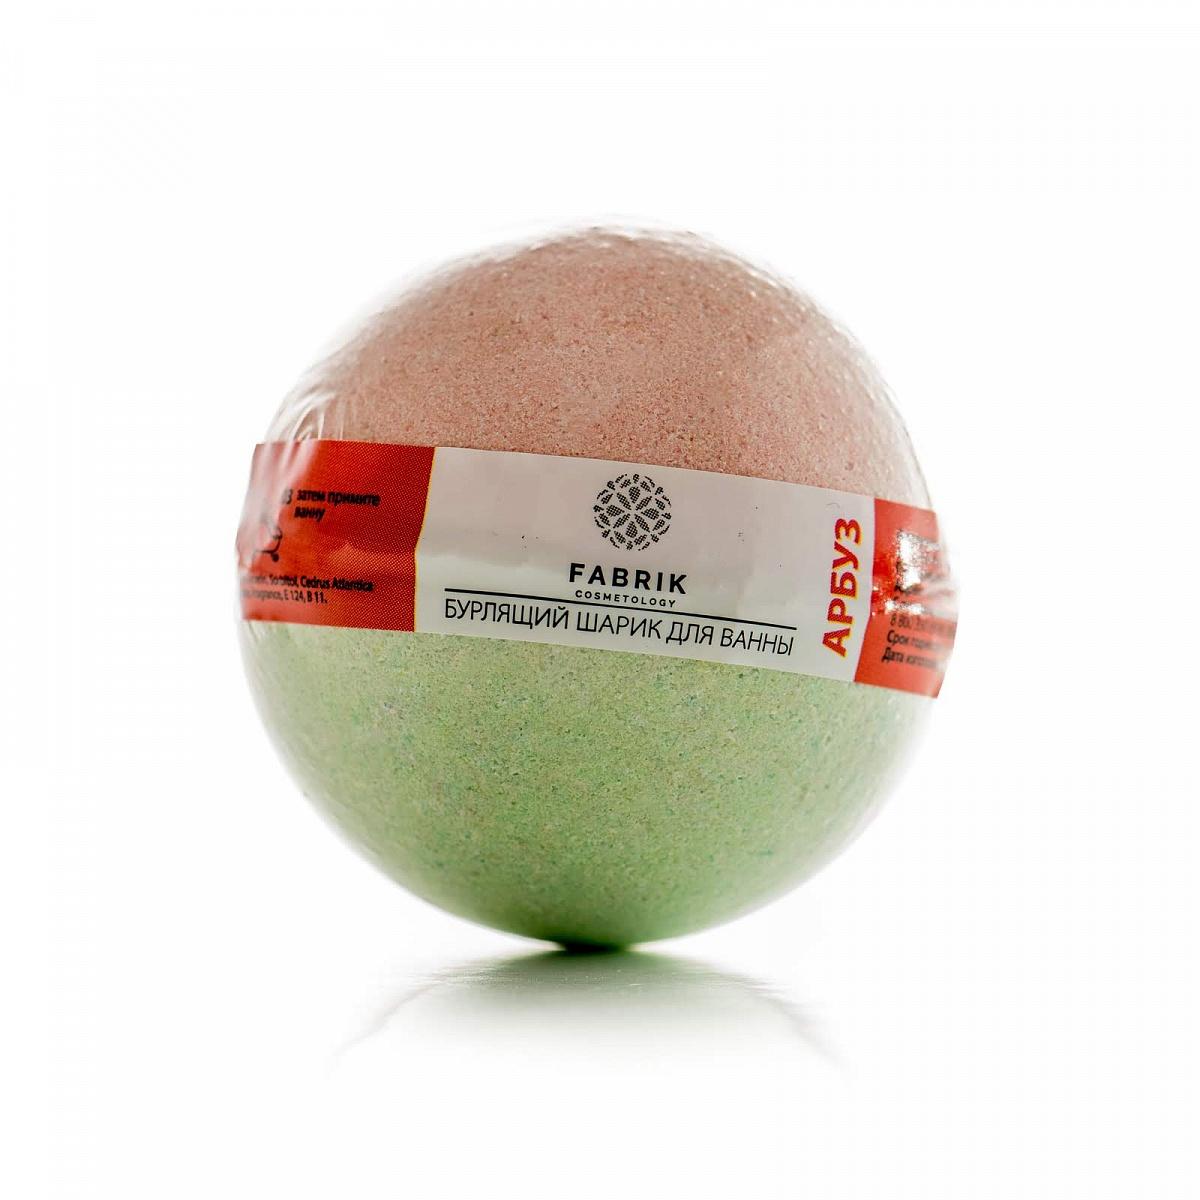 Бурлящий шарик для ванны Fabrik Cosmetology Арбуз